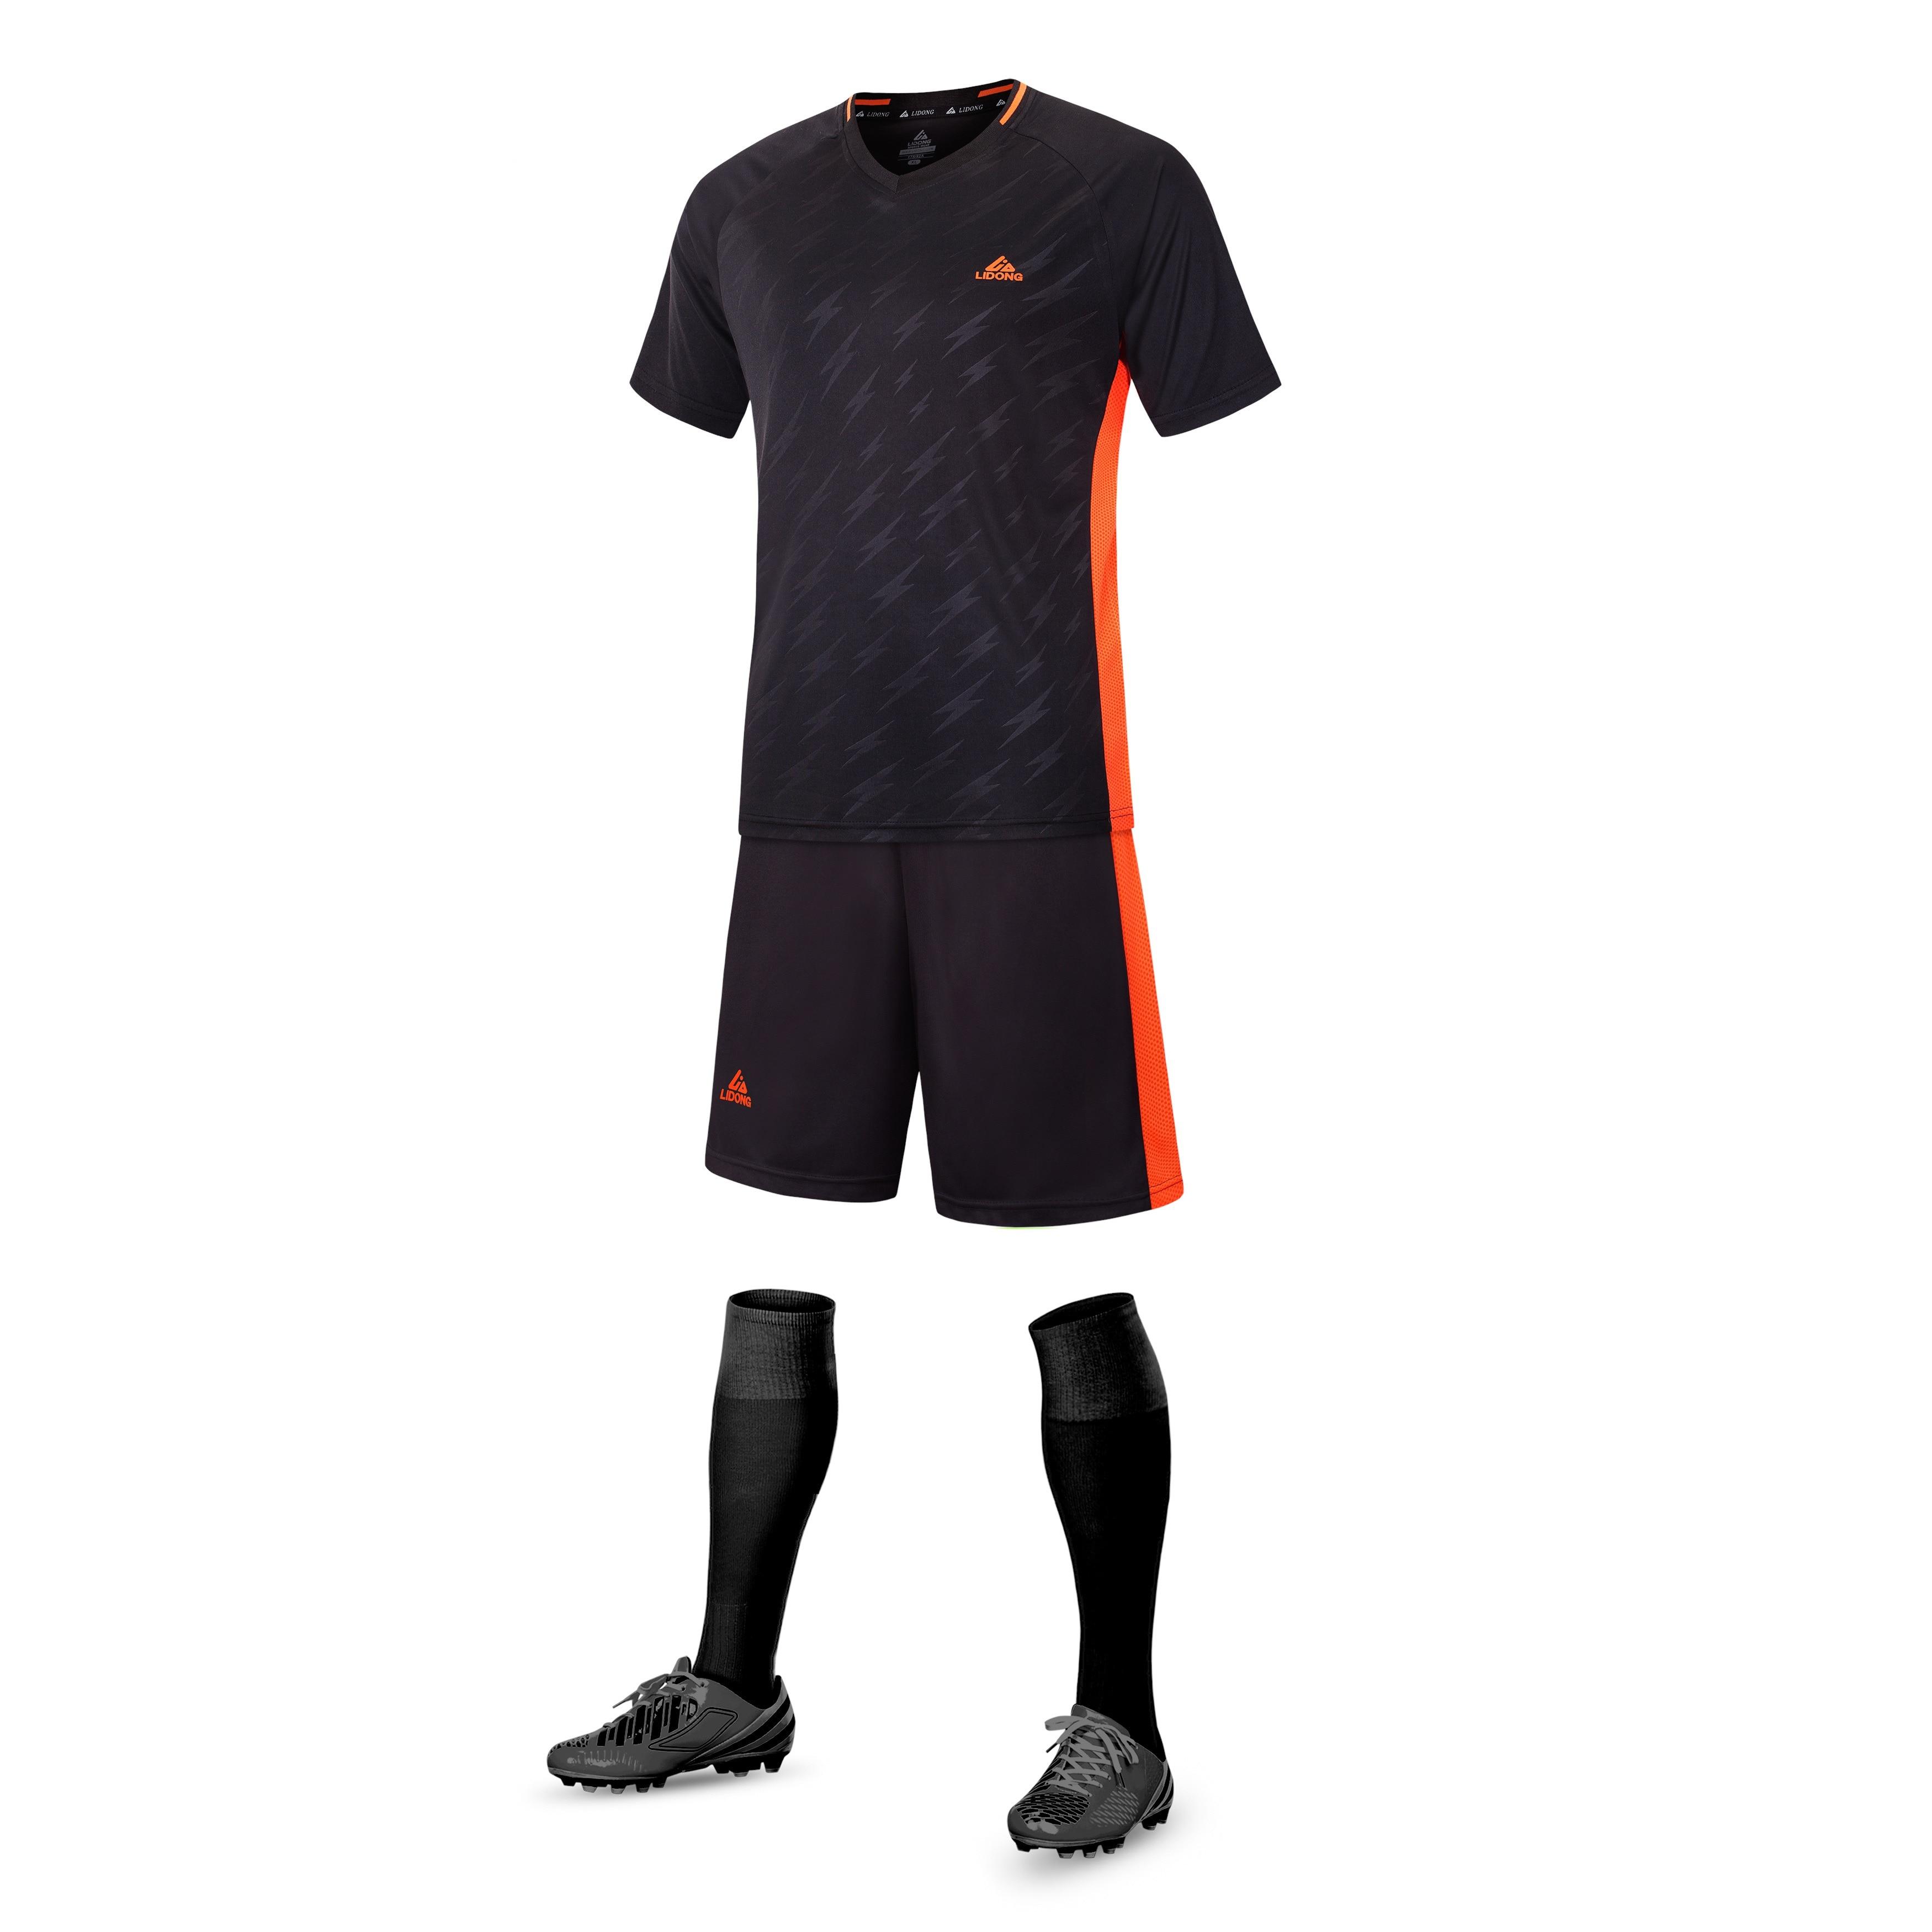 LiDong new Adult/Kids Football Jersey,Soccer Uniform,Quick Dry Soft Breathable Training Set, Teens sports,DIY Customization 020